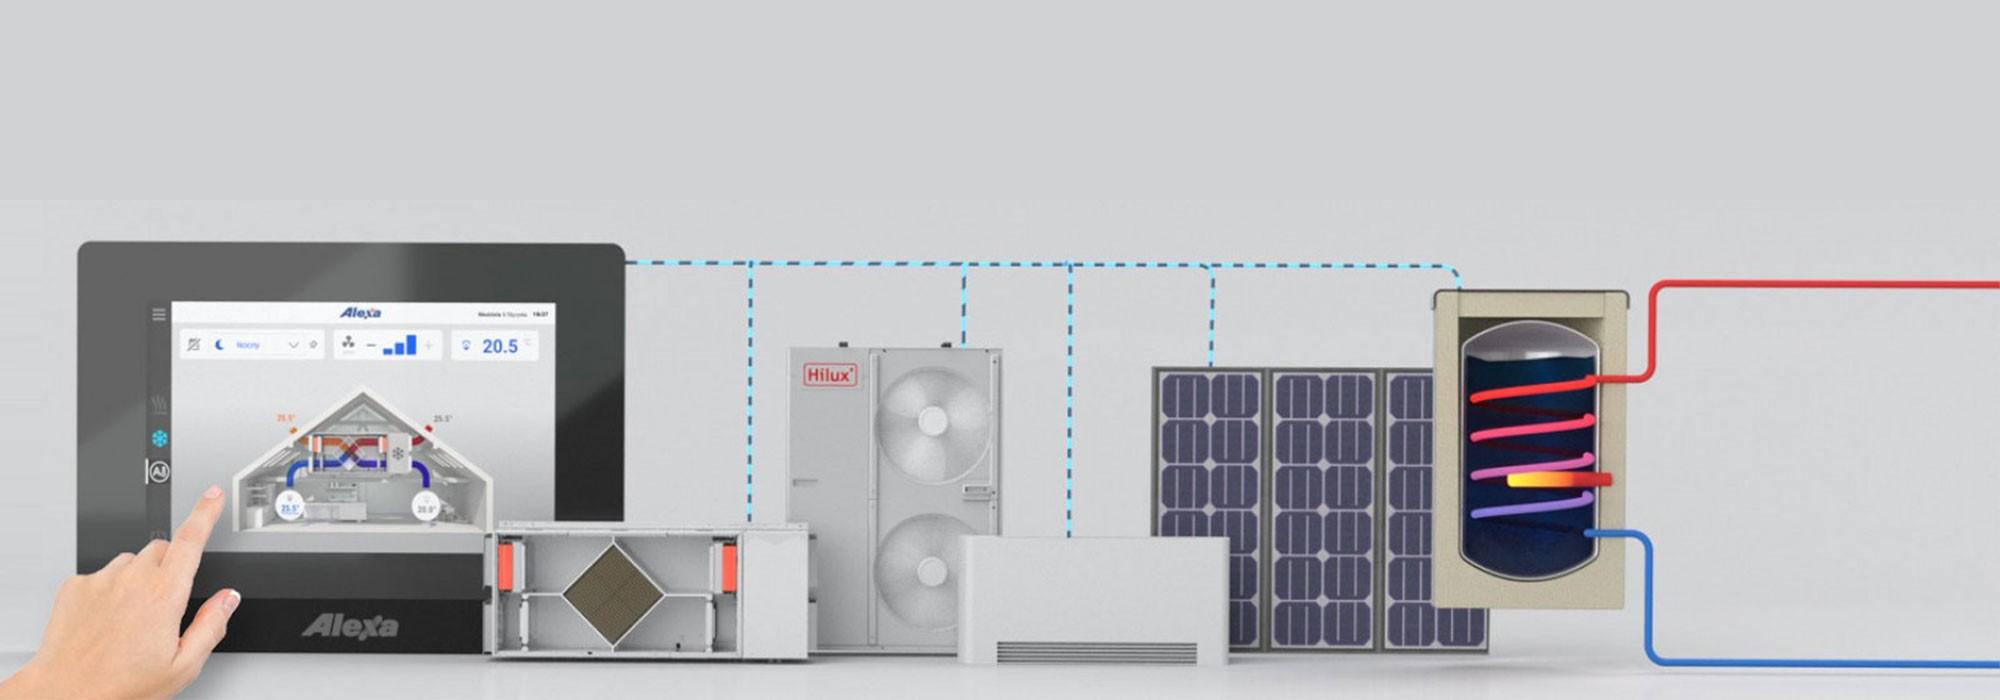 Alexa Climate Control